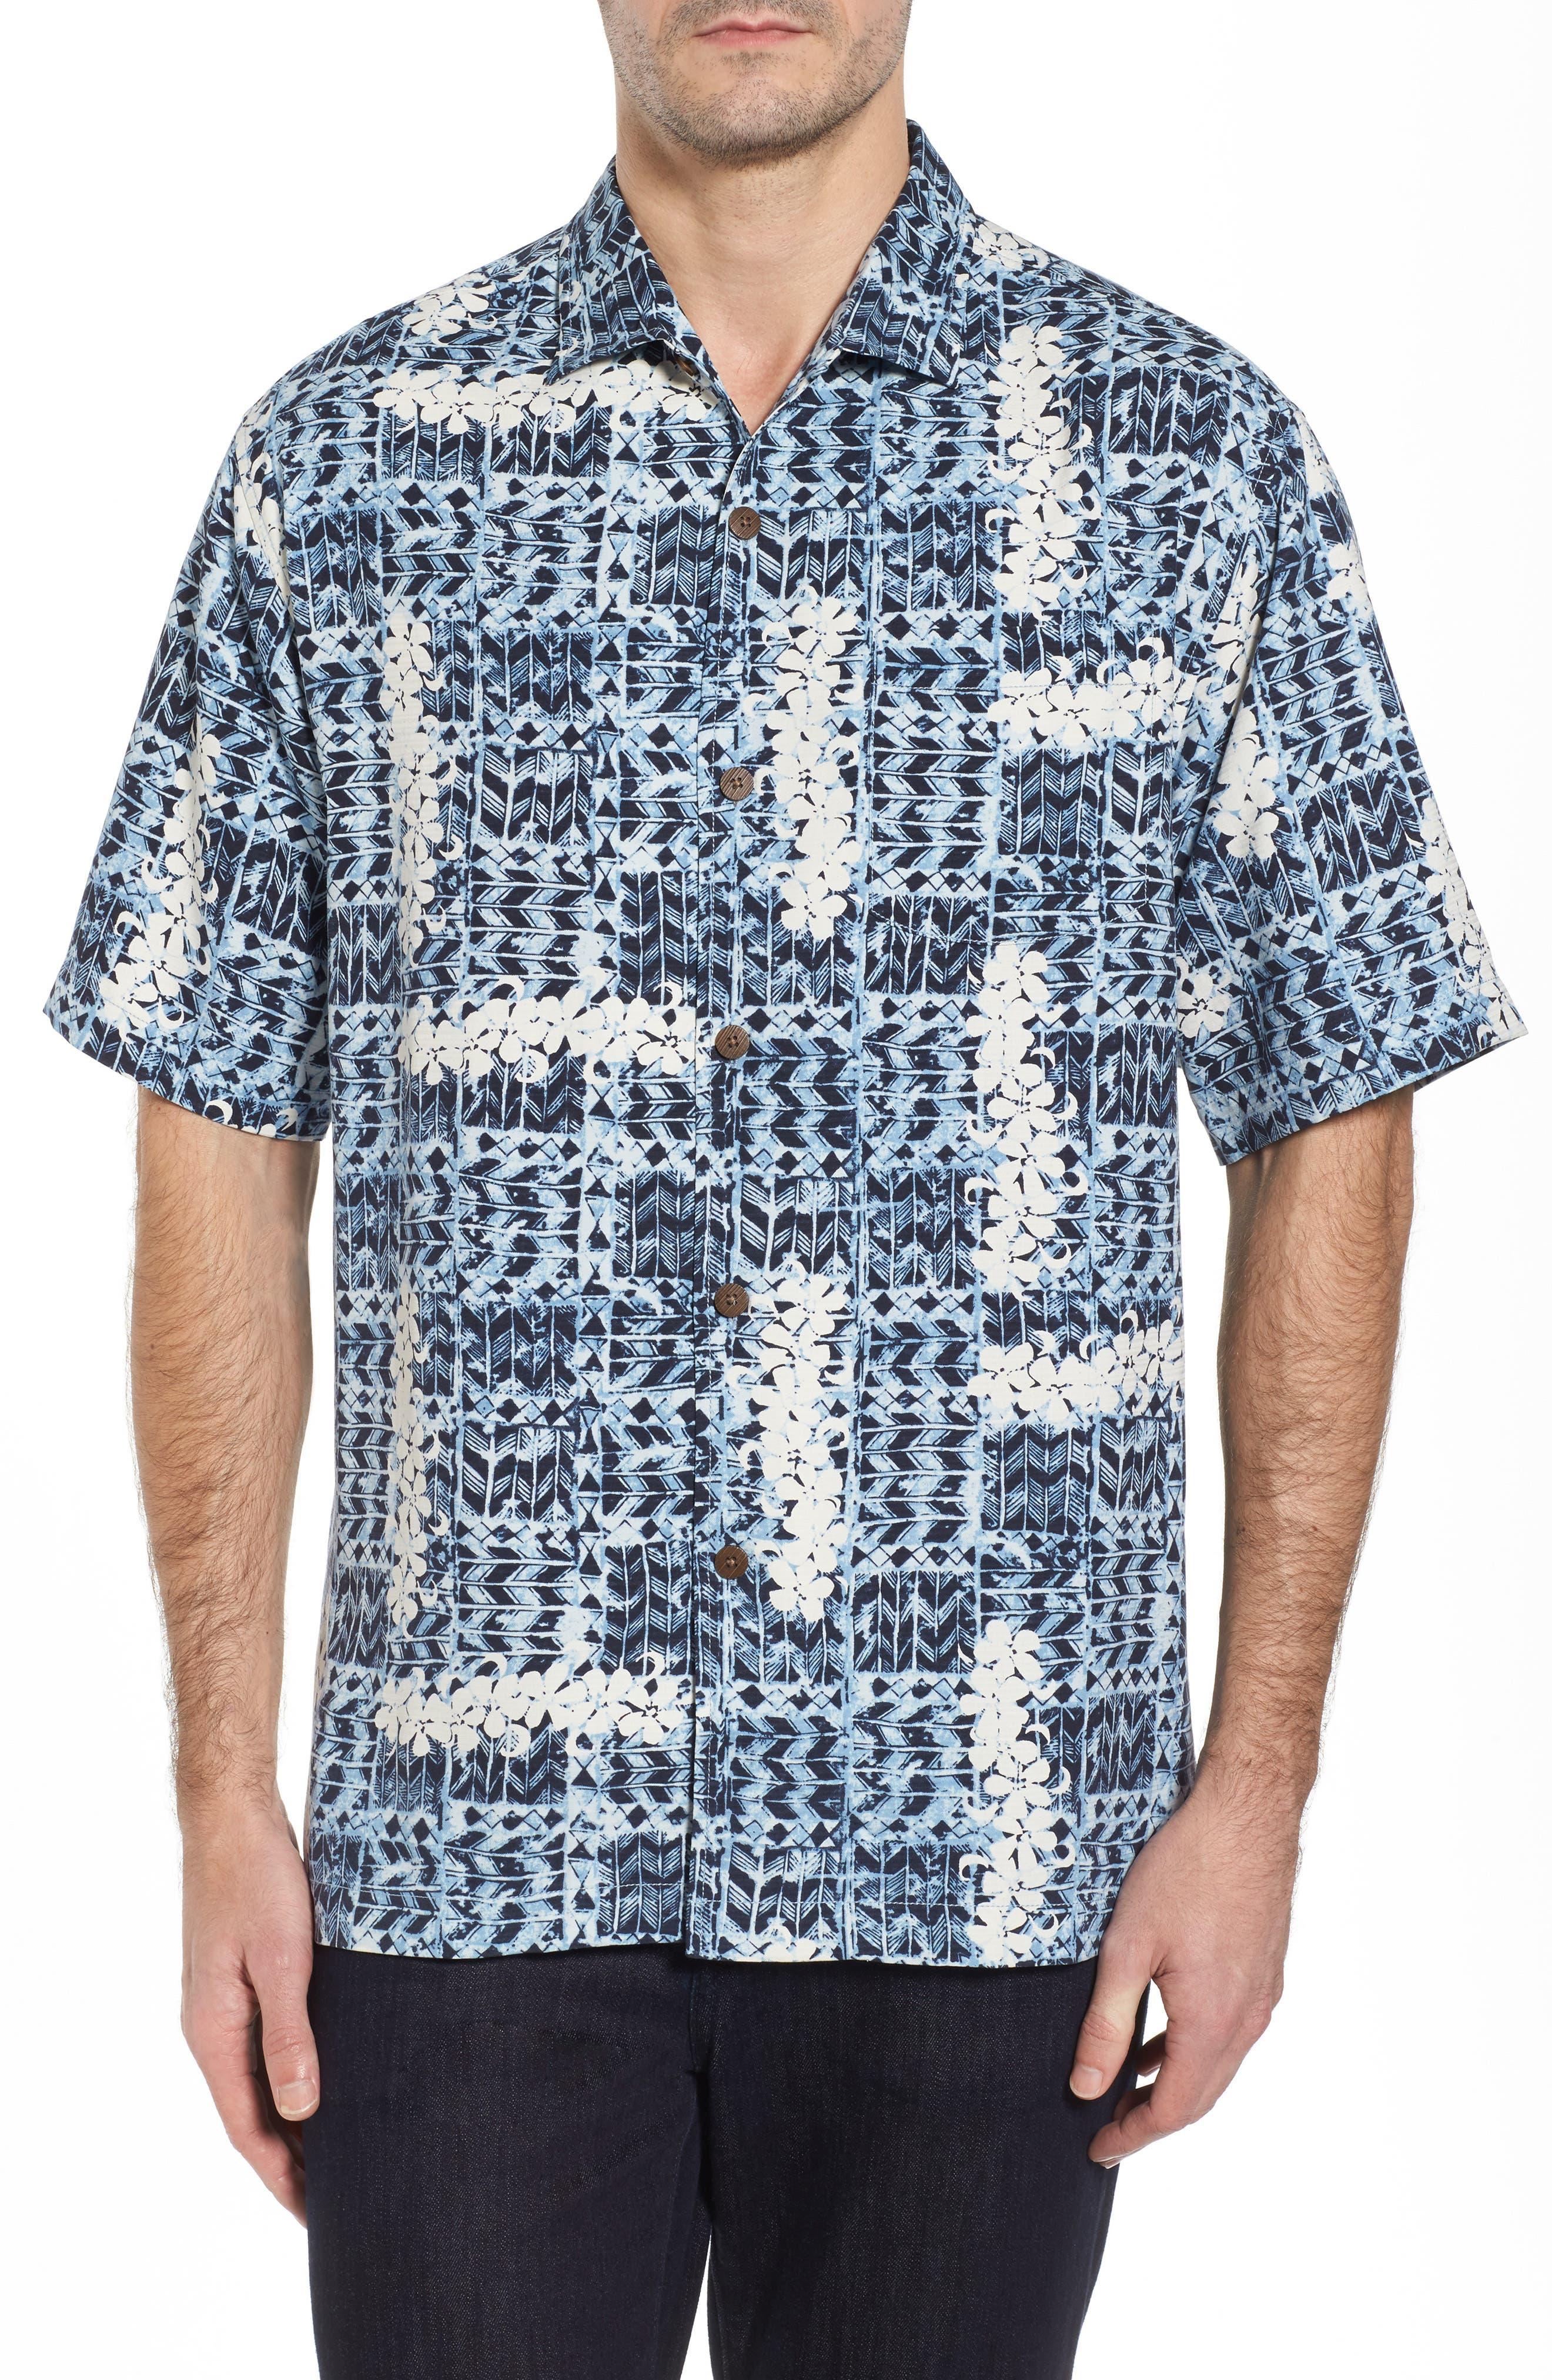 Olei Olei Silk Camp Shirt,                         Main,                         color, Bering Blue